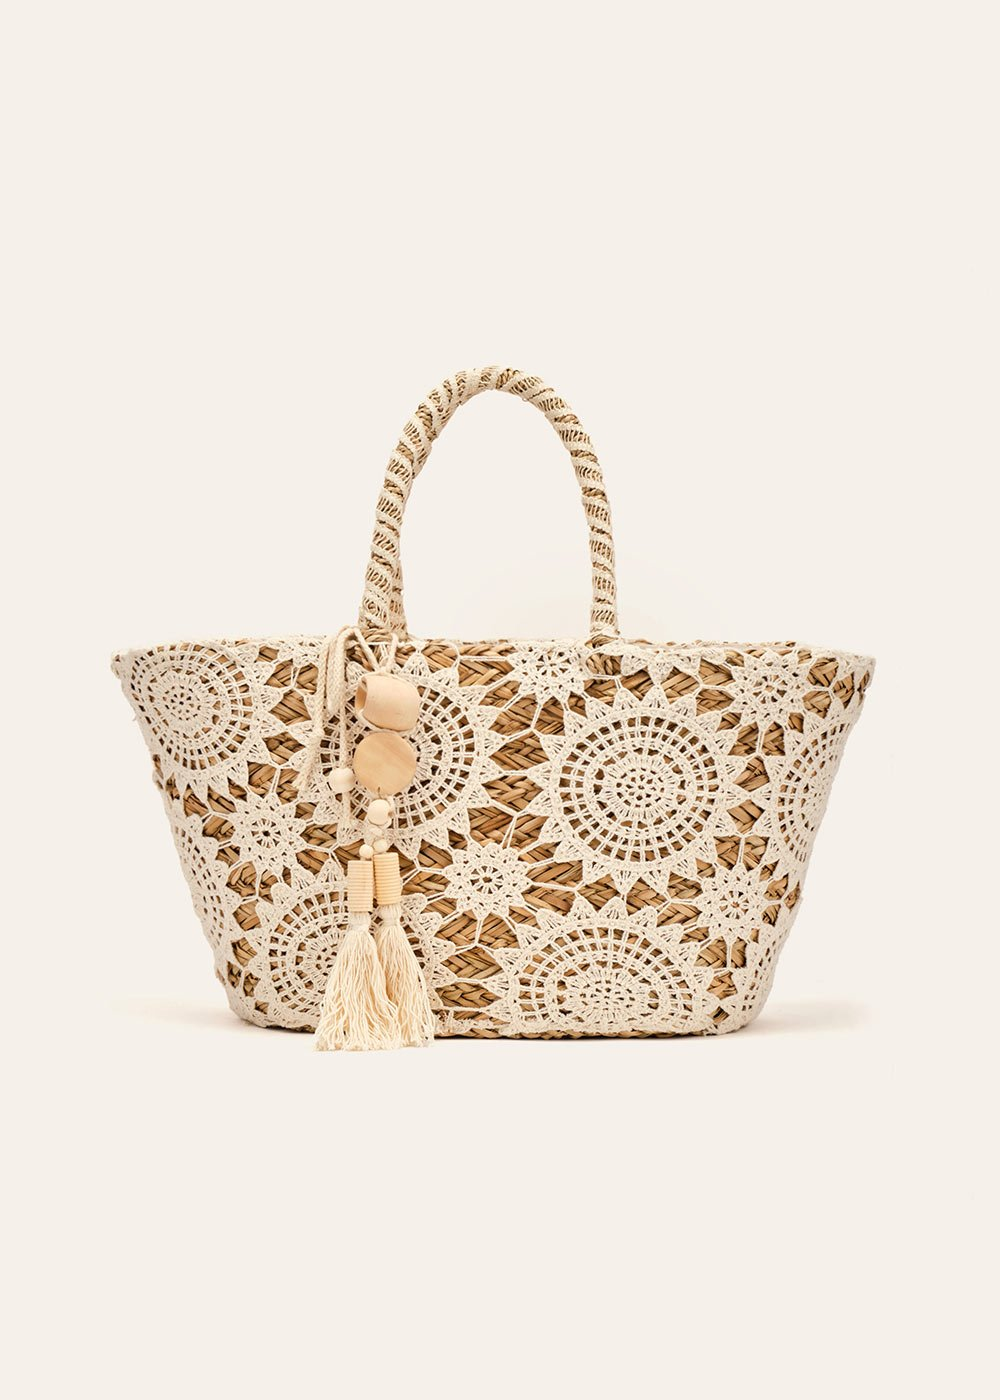 Barcelona crochet and straw beach bag - Safari  / Mousse - Woman